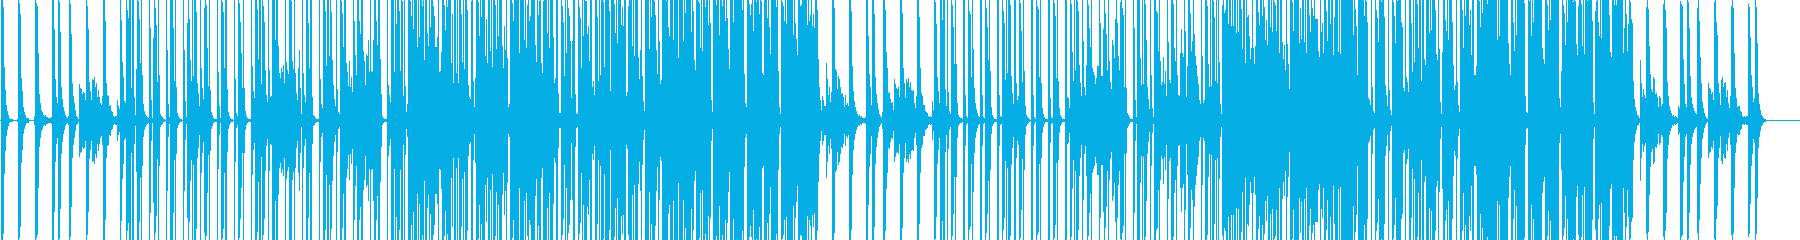 lay lowの再生済みの波形